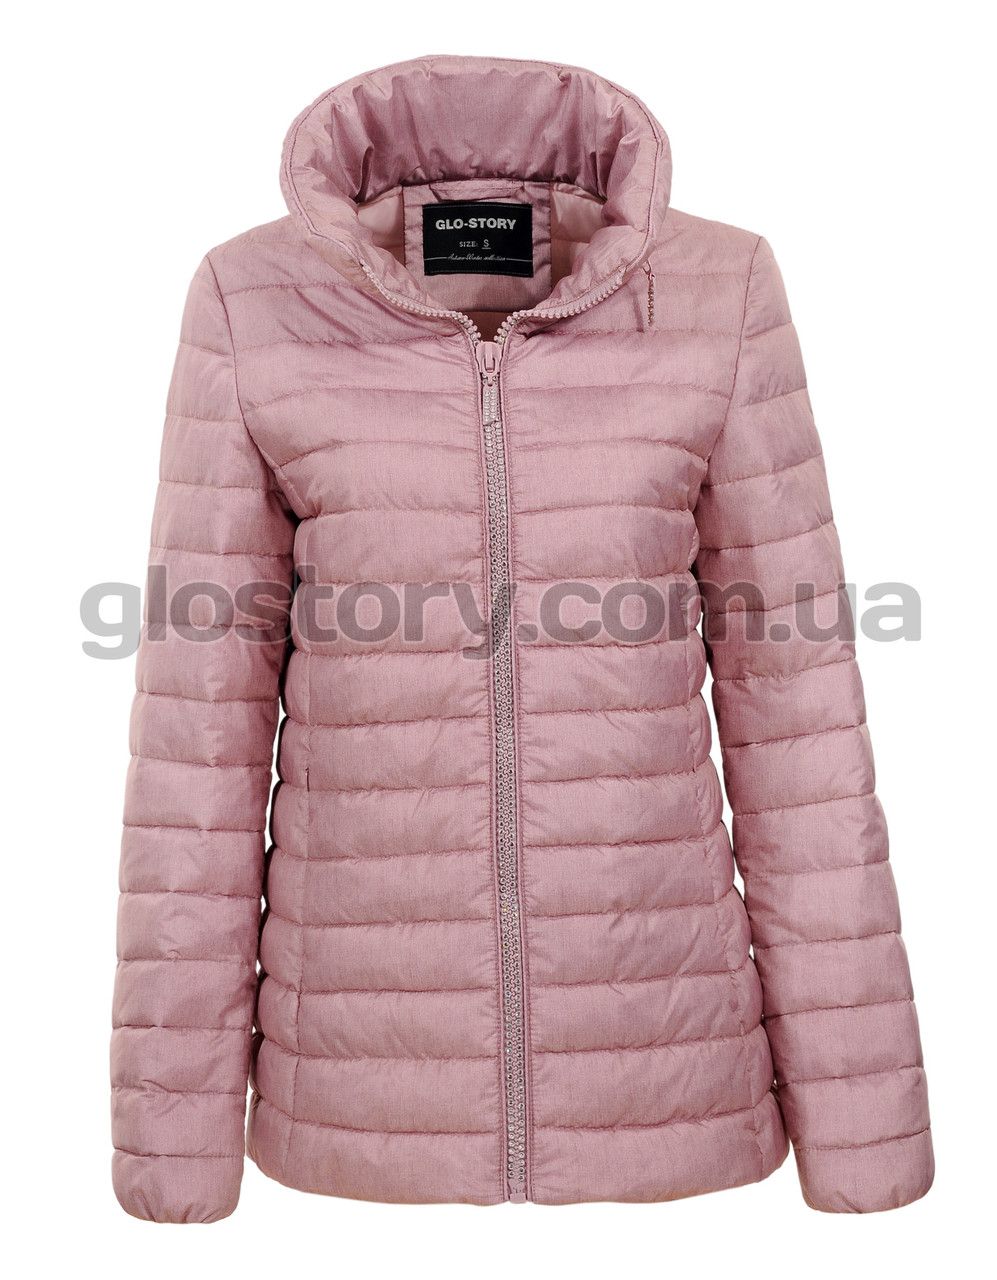 Женская куртка Glo-Story